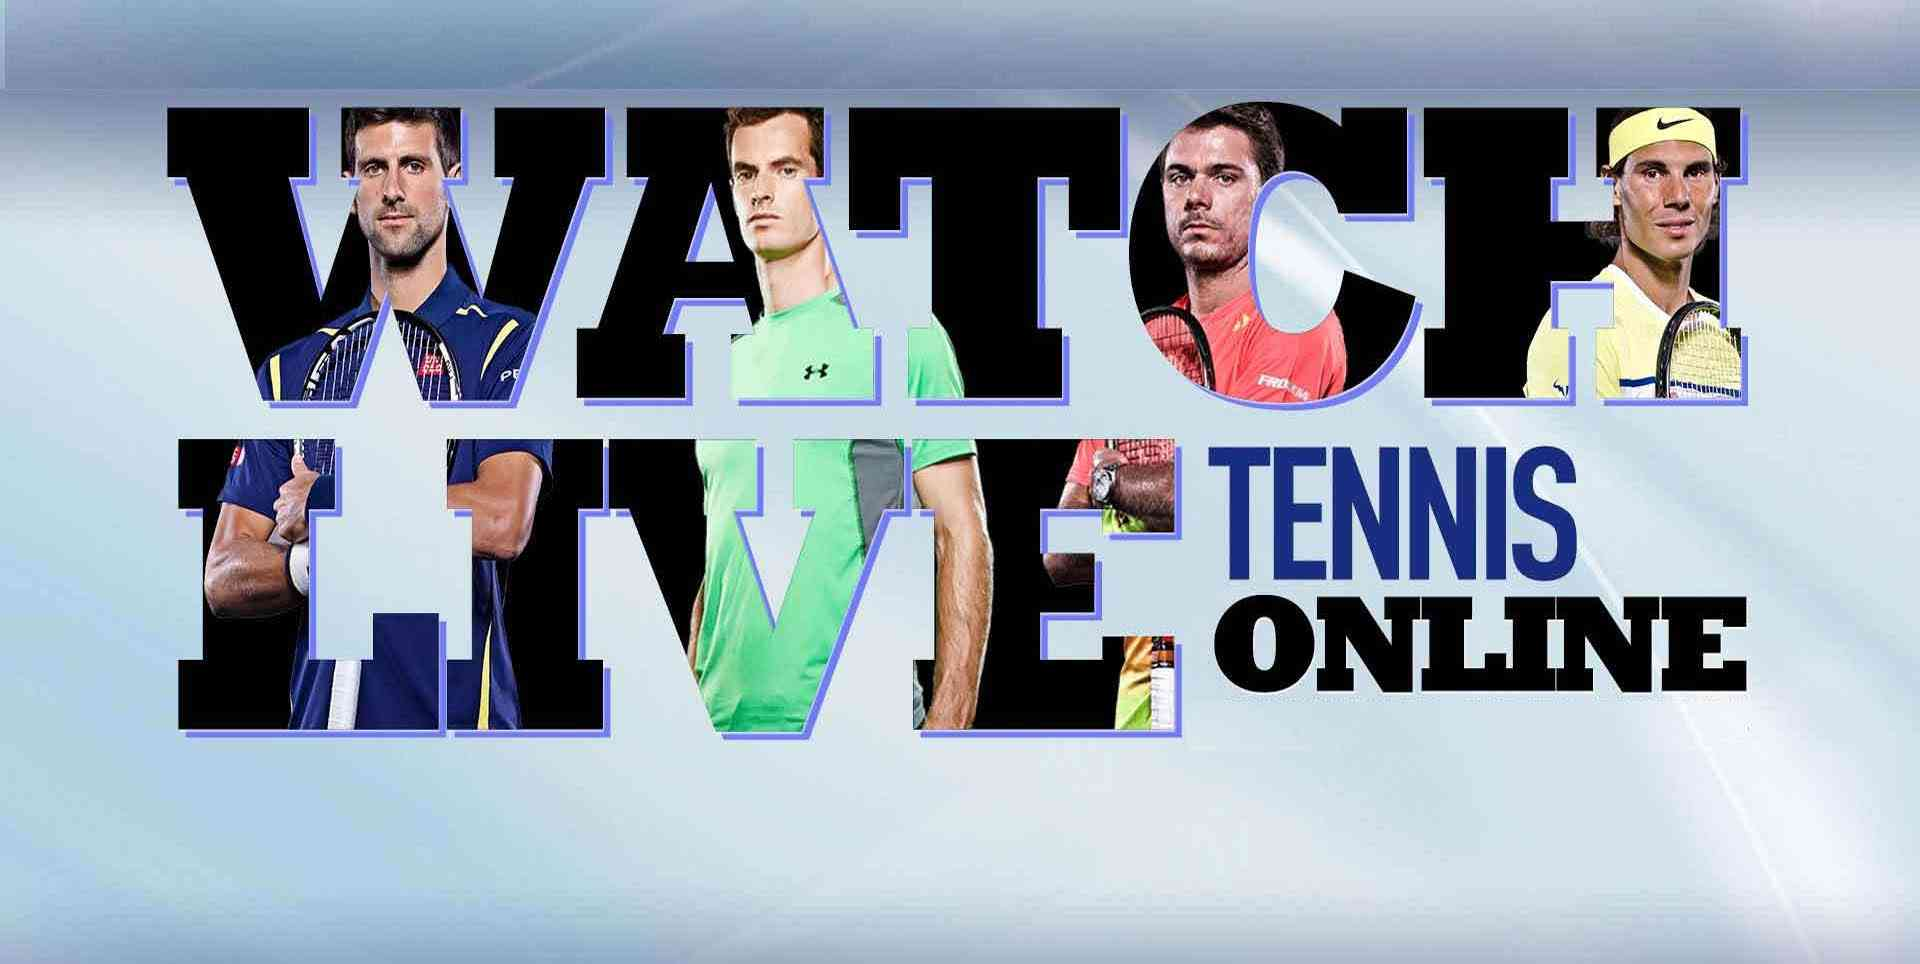 Watch A. Pavlyuchenkova | L. Safarova vs A. Hlavackova | J. Zheng Quarter Final Online